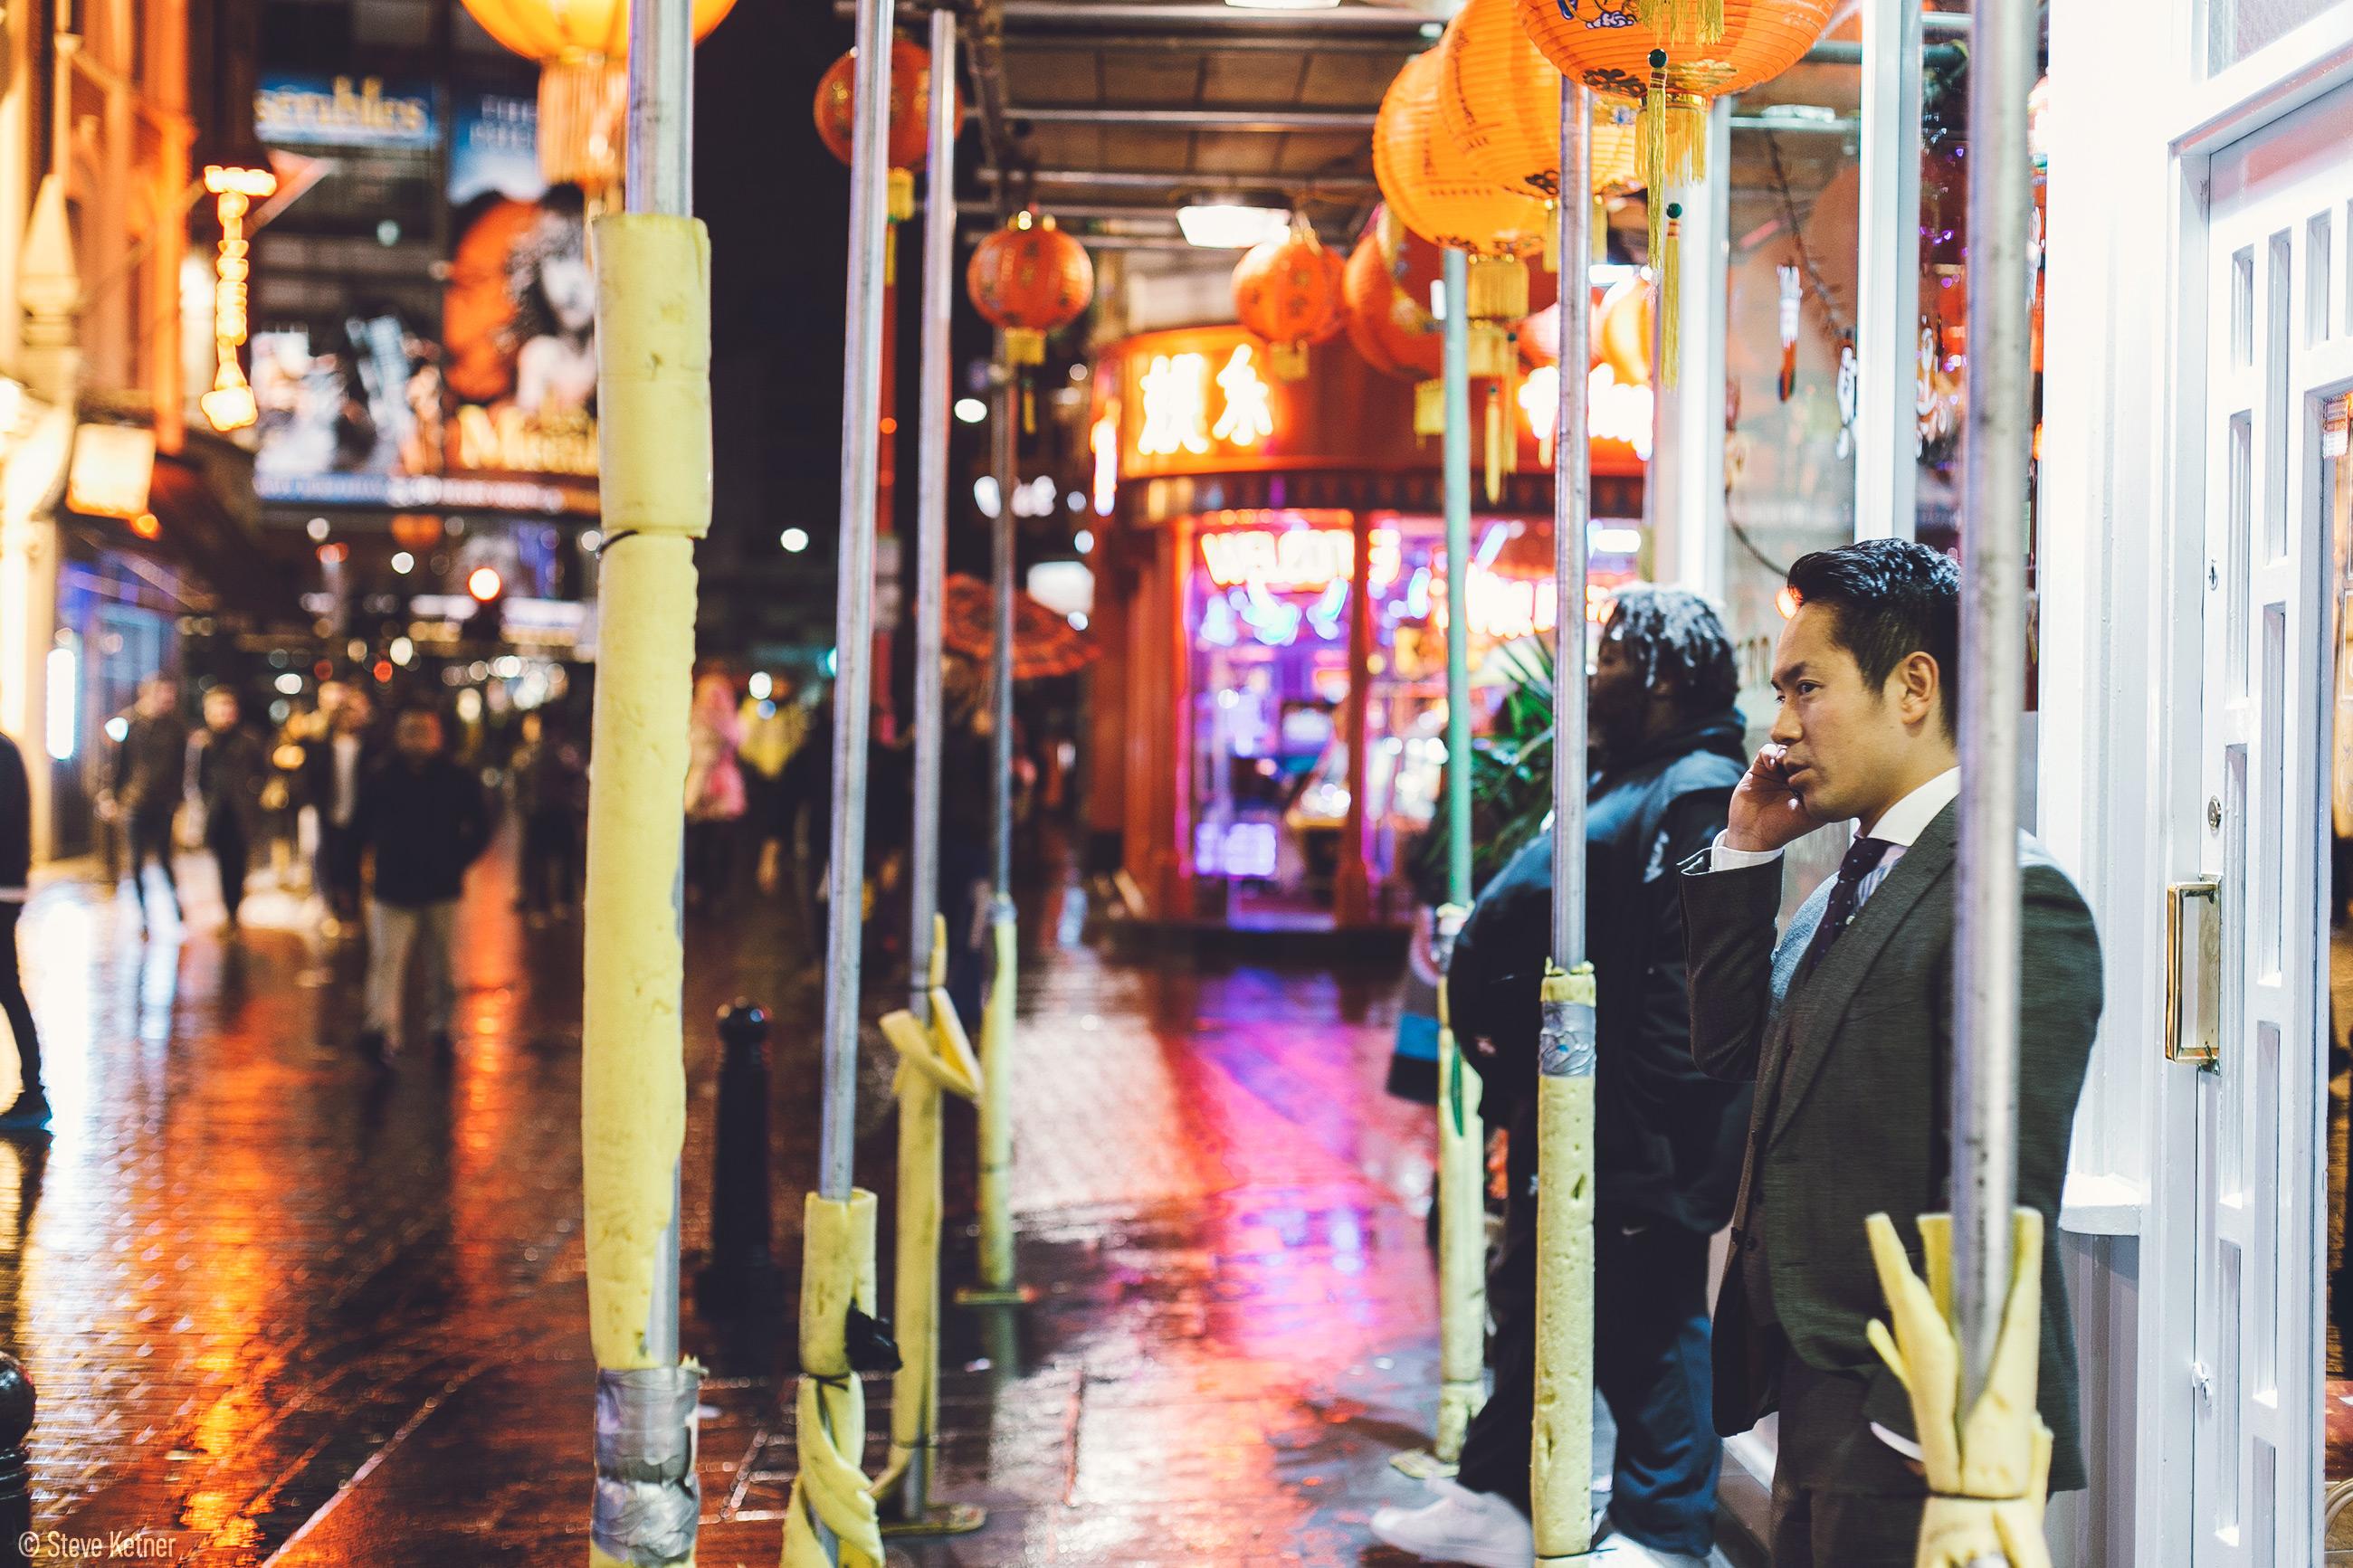 Steve Ketner - Chinatown, London